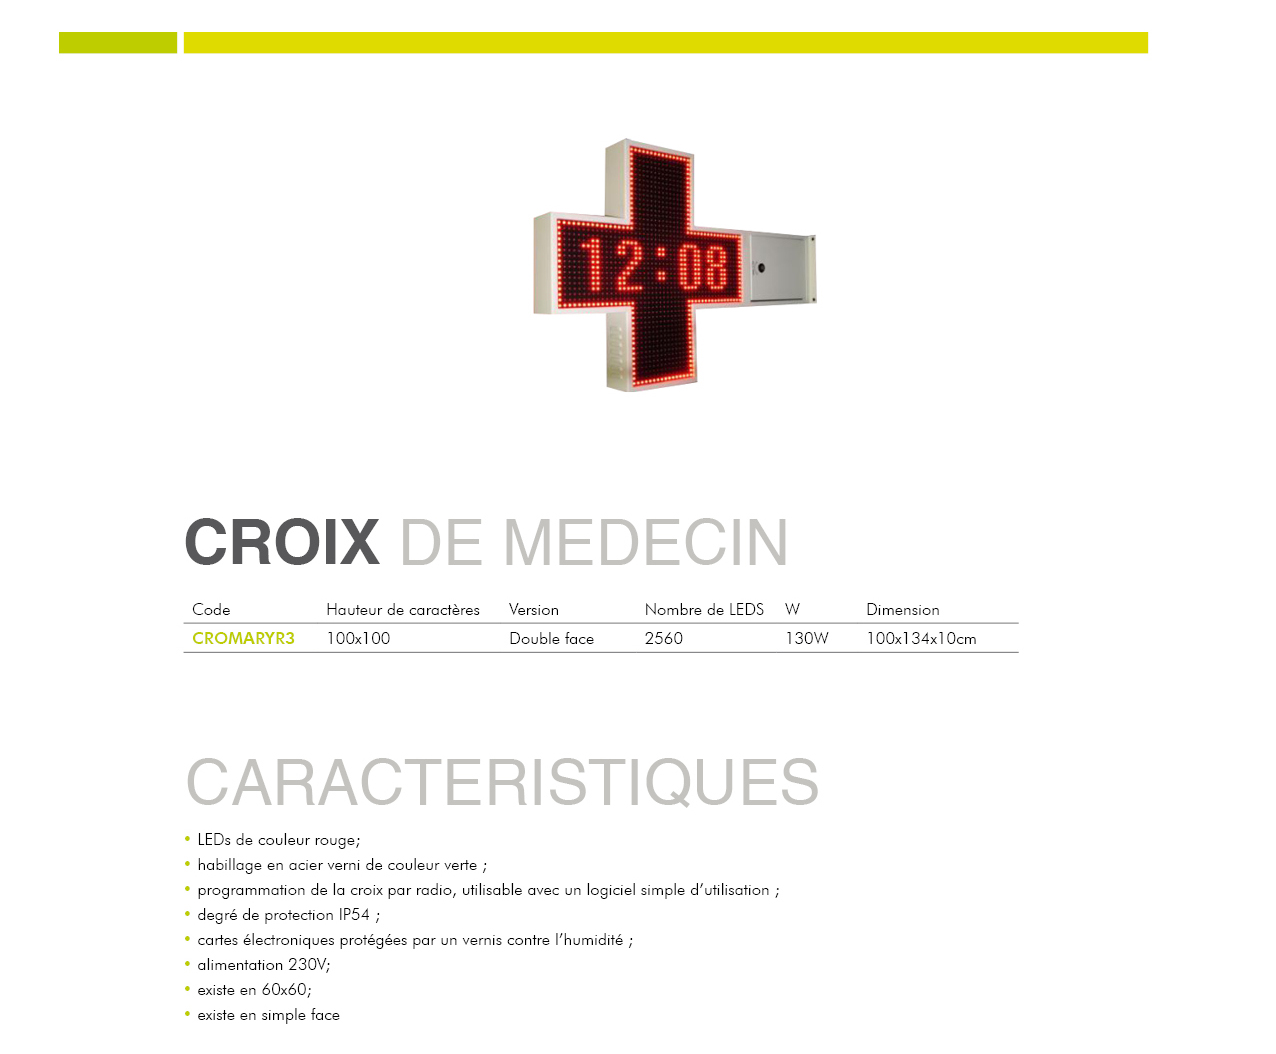 DEF-catalogue-gheury-23-06-2017174